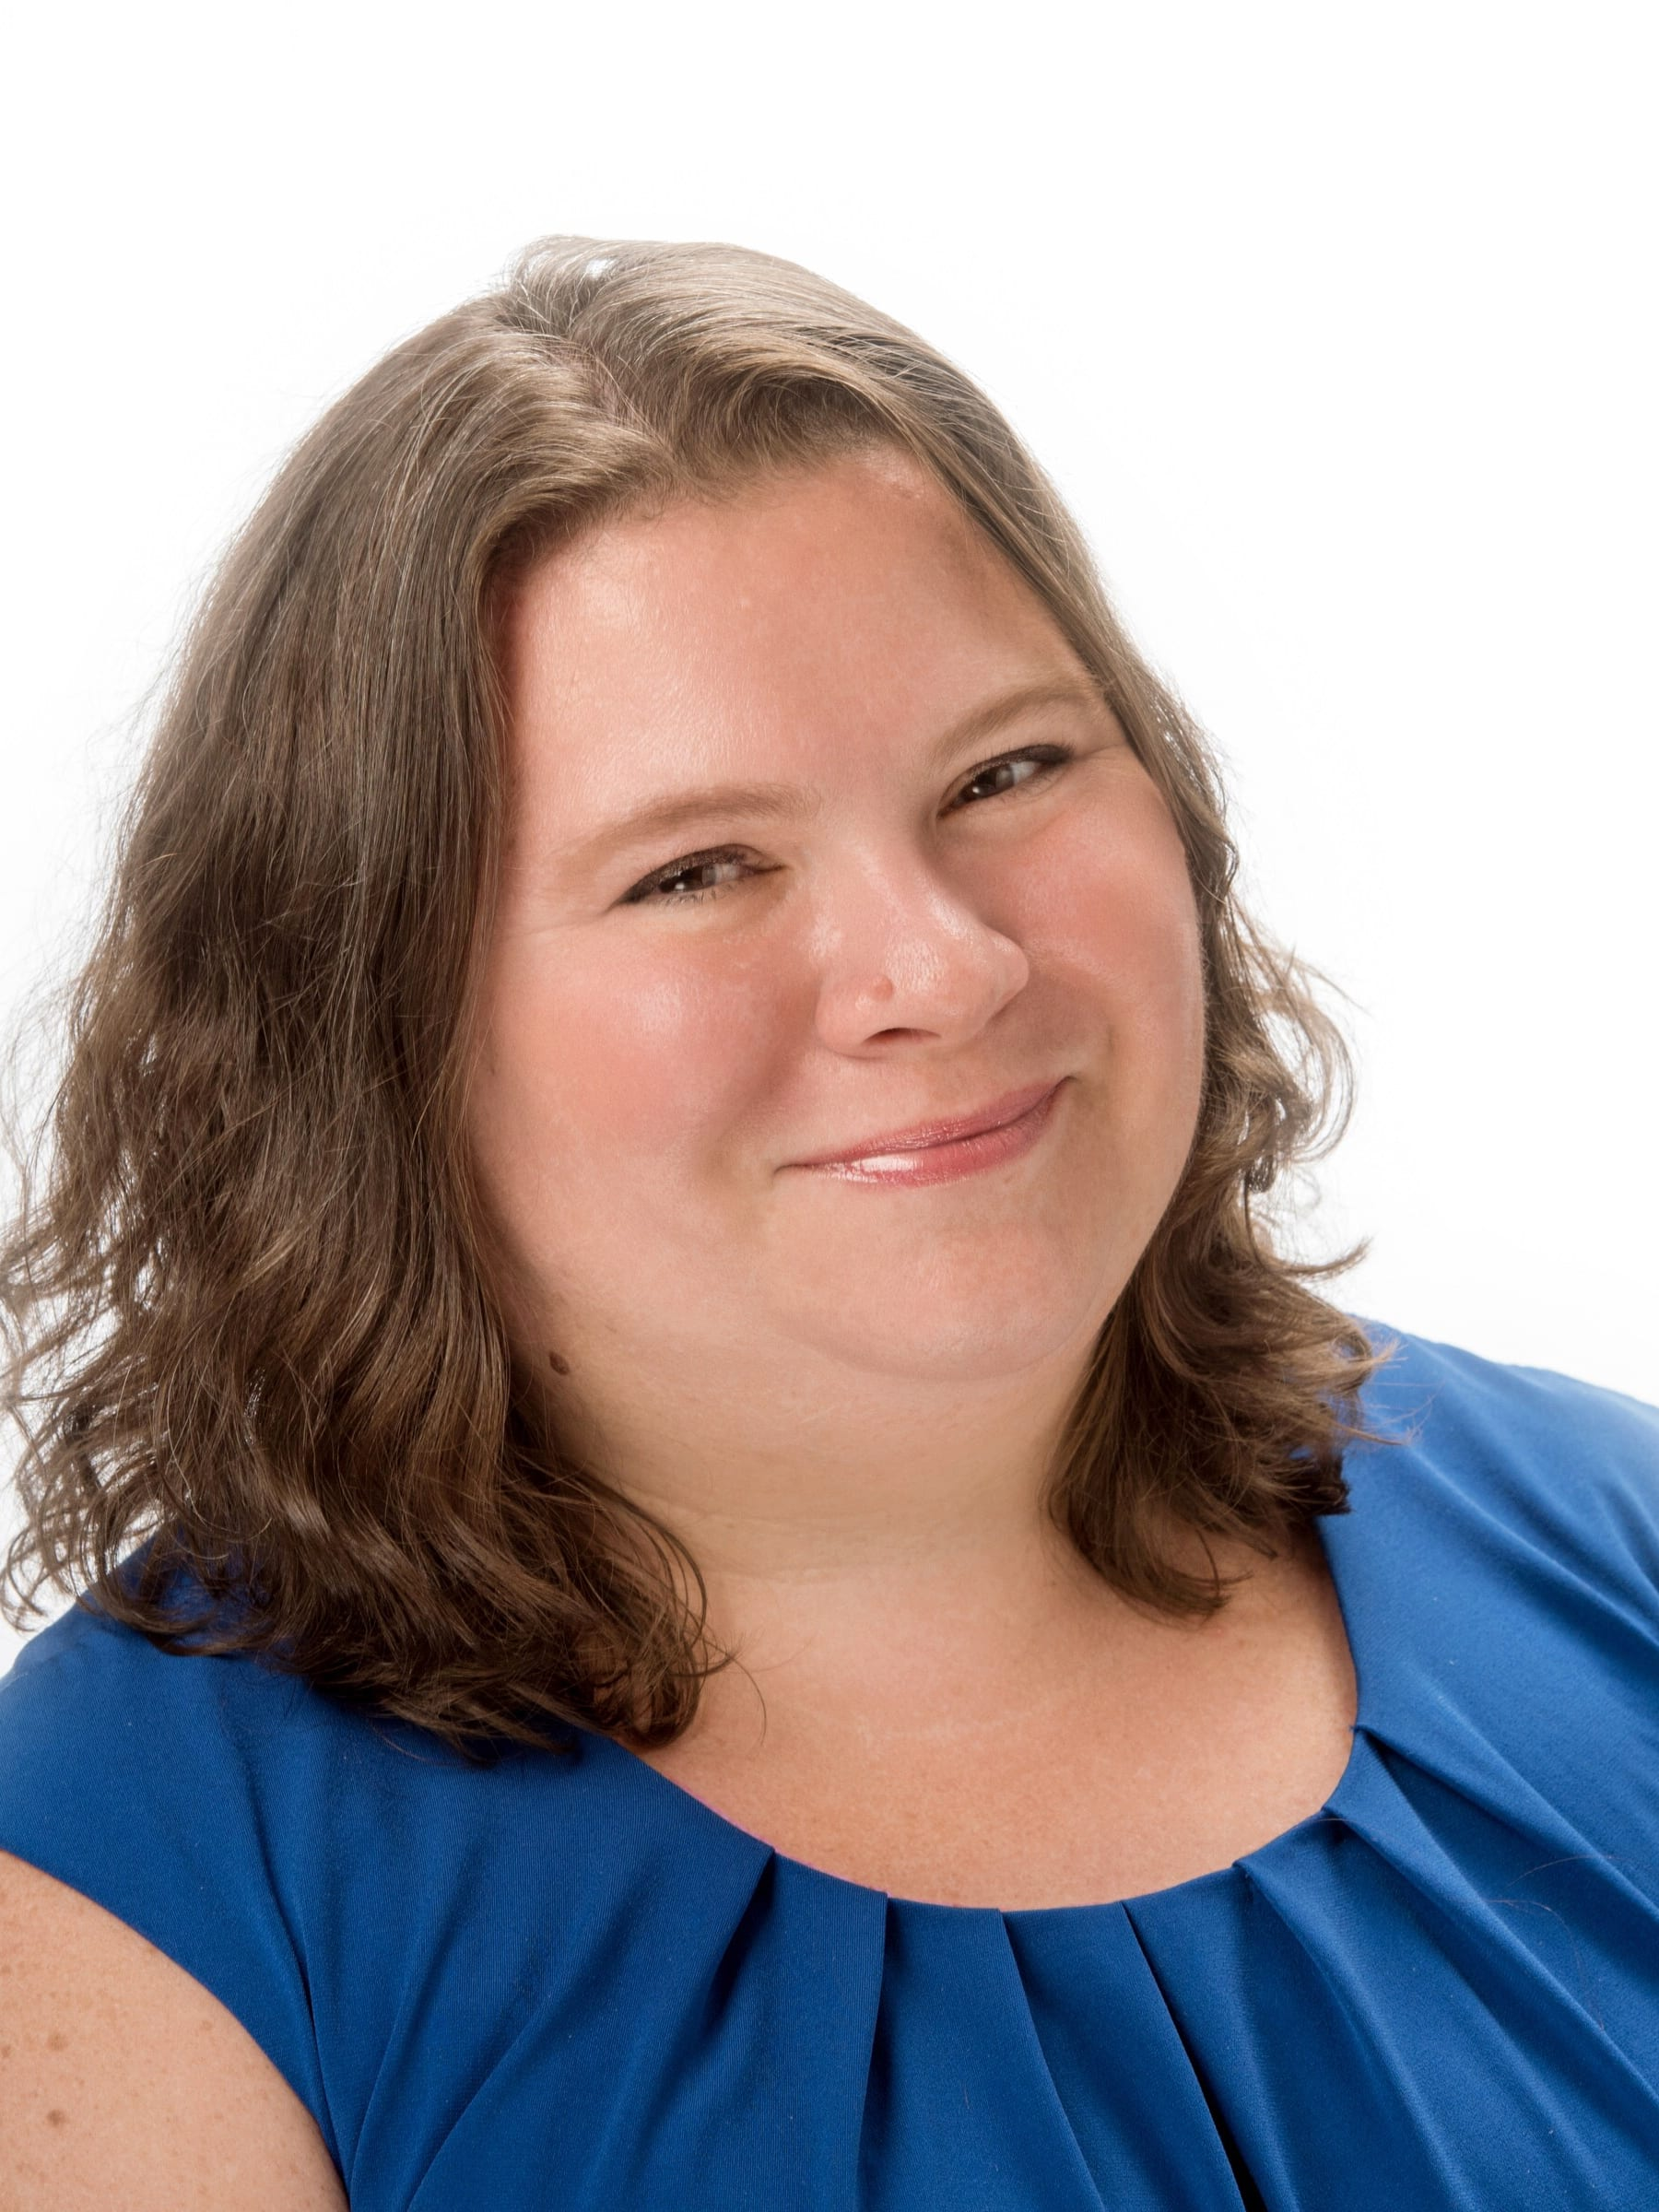 Erin Morelli